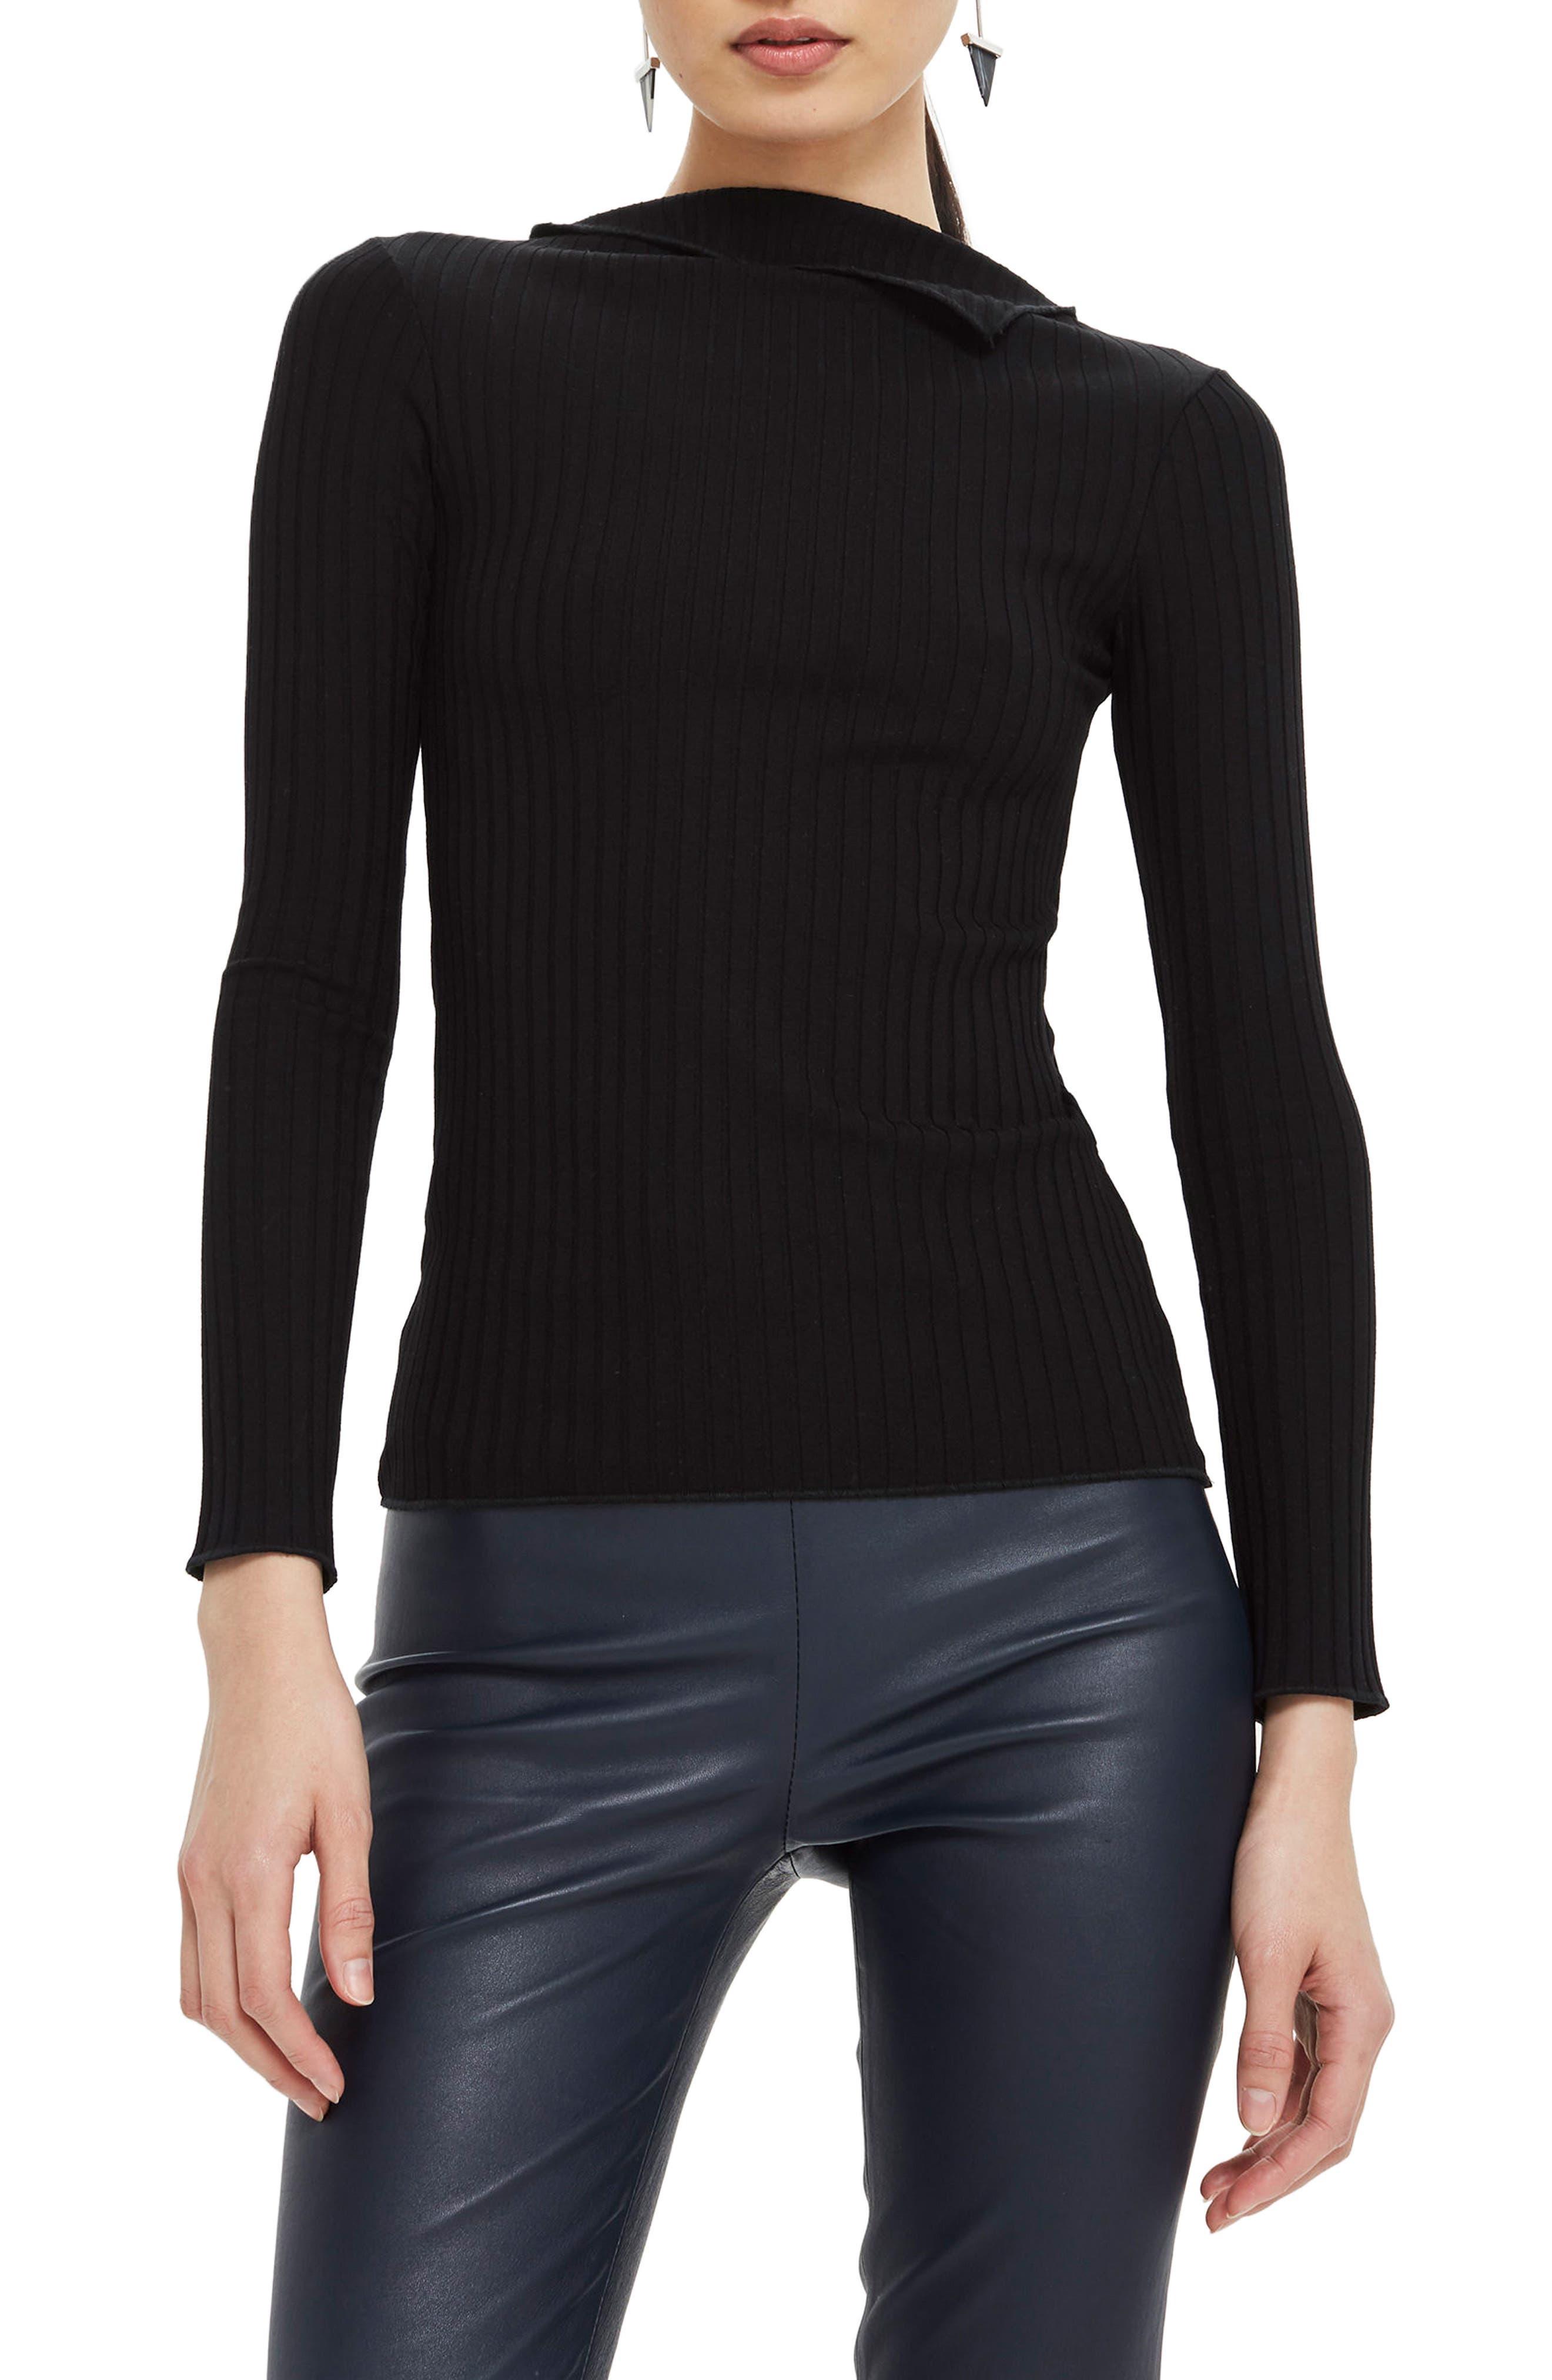 Topshop Boutique Fold Neck Rib Shirt